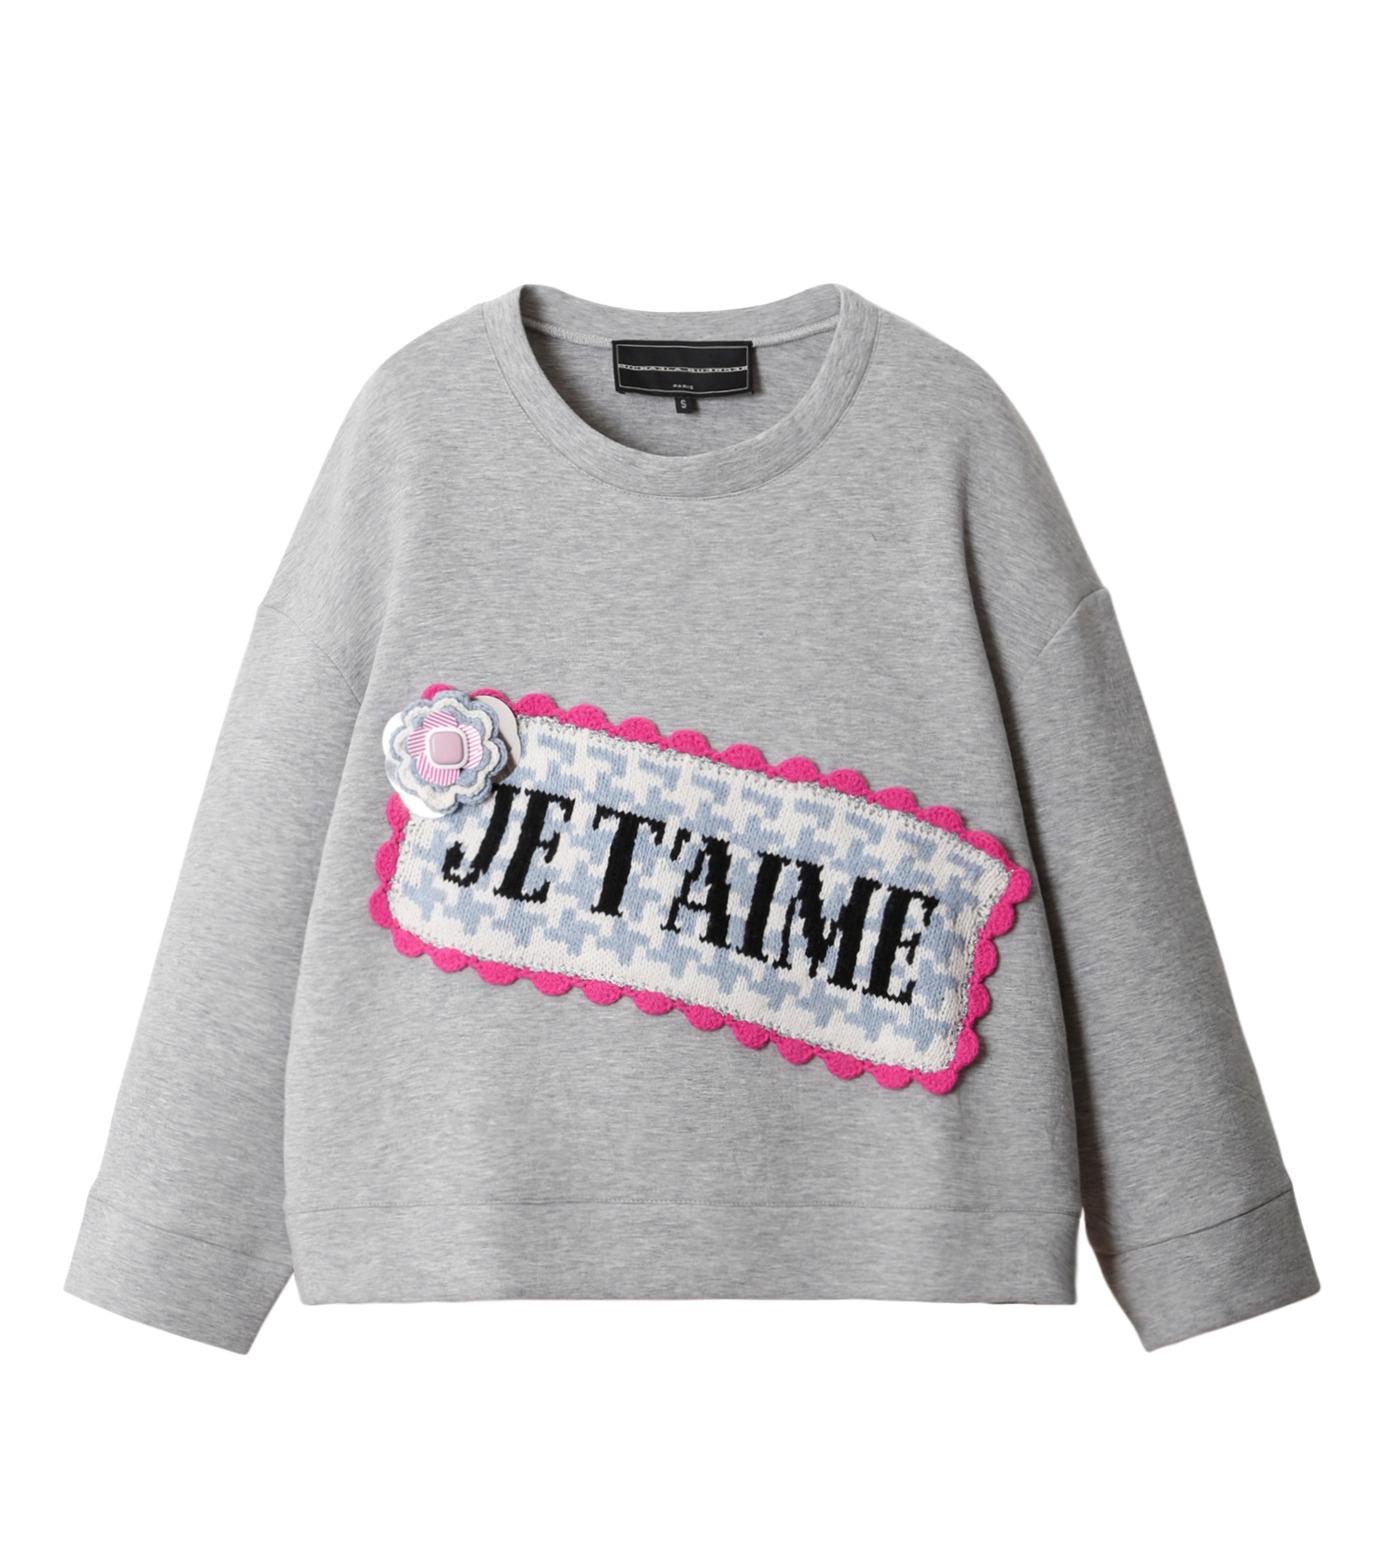 Michaela Buerger(ミカエラ バーガー)のJe t'aime Oversize Sweatshirt-GRAY(カットソー/cut and sewn)-AMB027-11 拡大詳細画像1